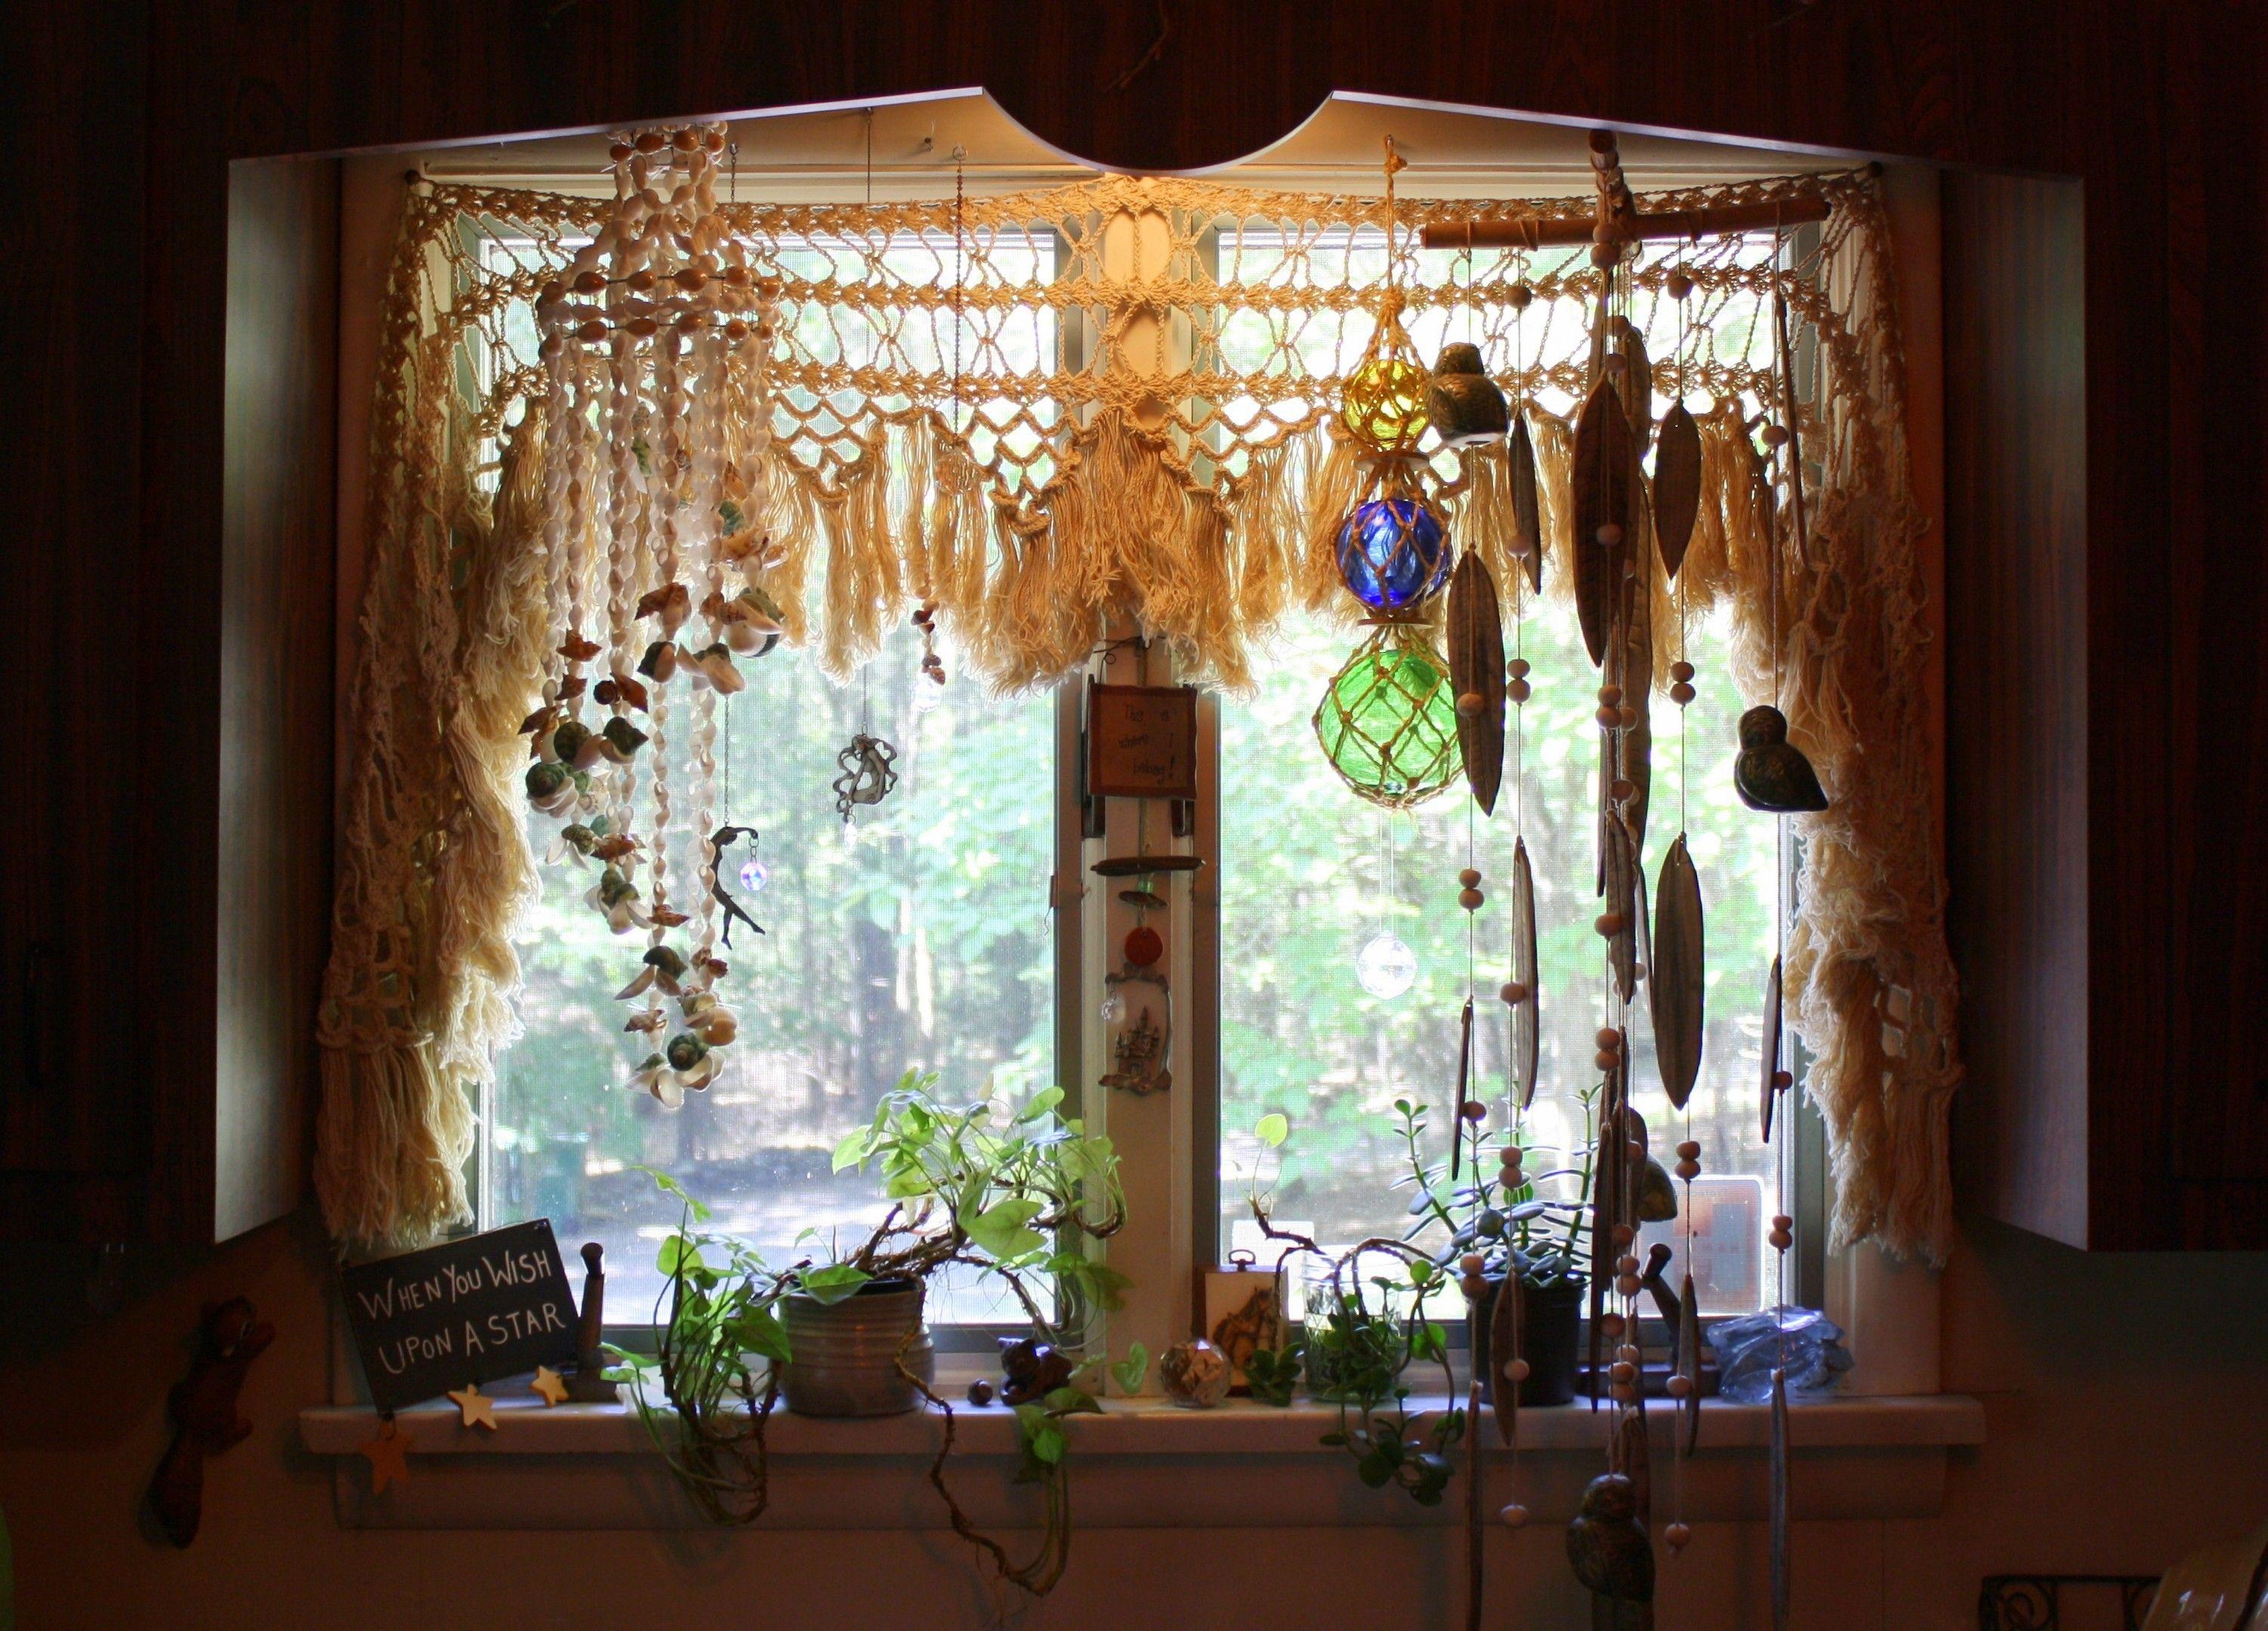 #hippie #bohemian #gypsy #decor #majikhorse #window #kitchen #thrift